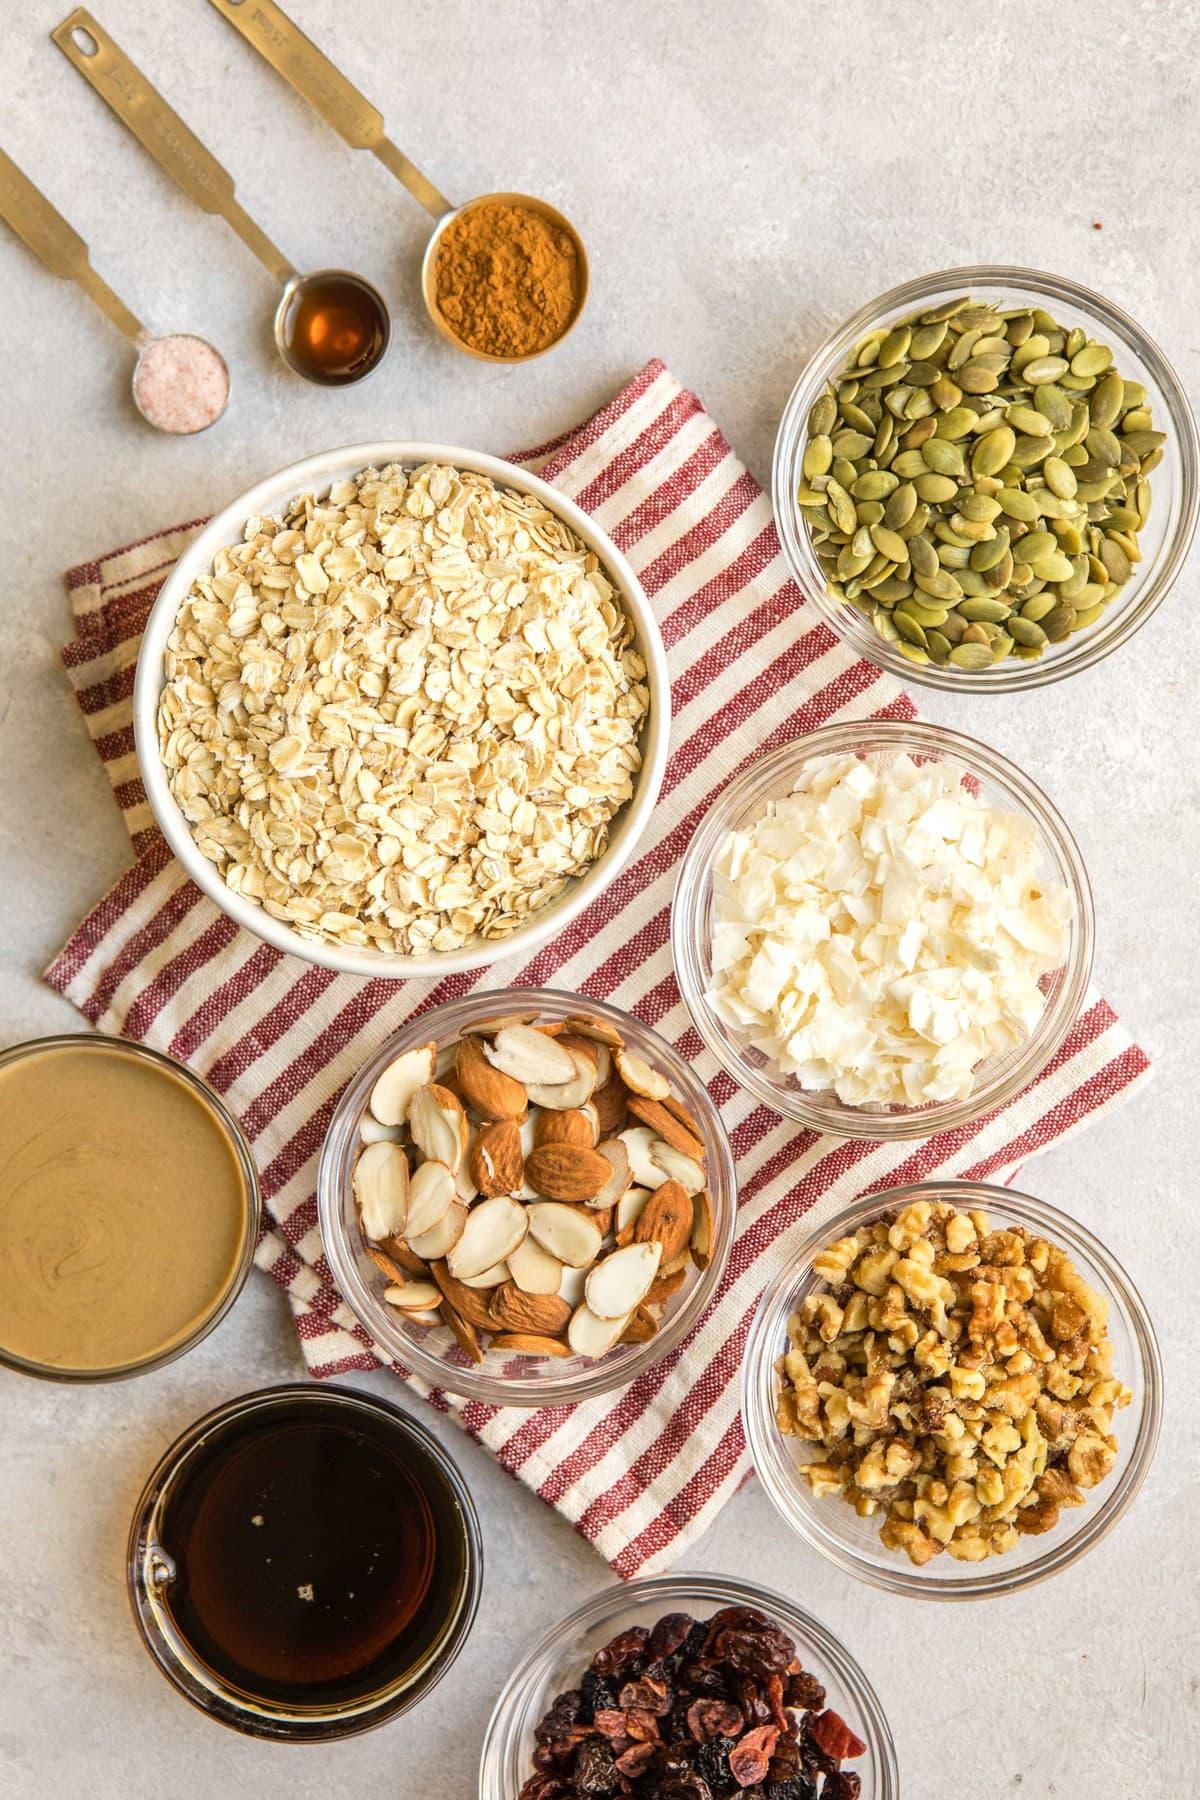 Easy Vegan Granola Recipe (9 Ingredients!) - From My Bowl